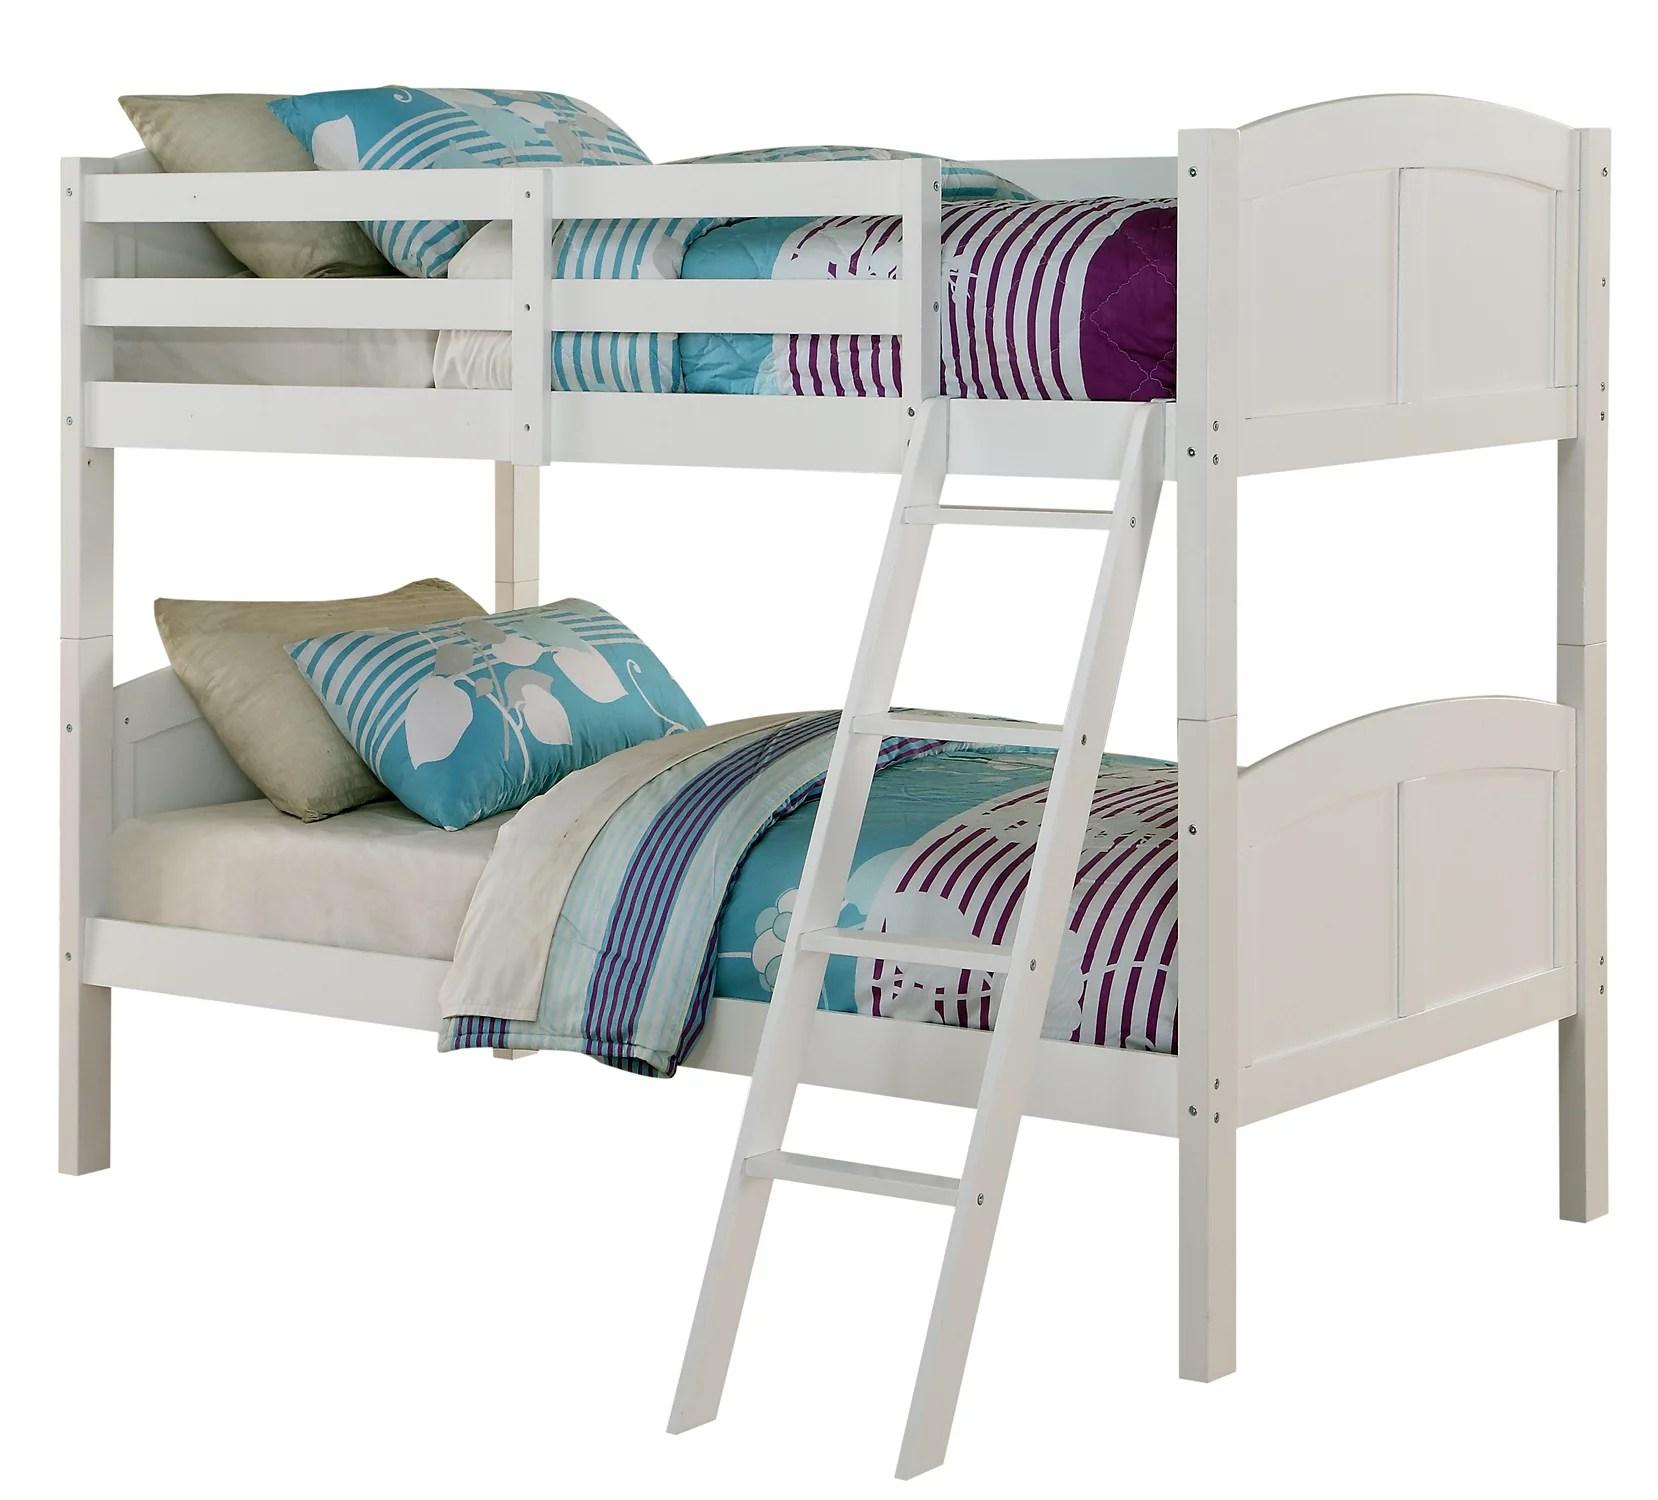 Angel Line Creston Twin Over Twin Wood Convertible Bunk Bed Multiple Colors Walmart Com Walmart Com